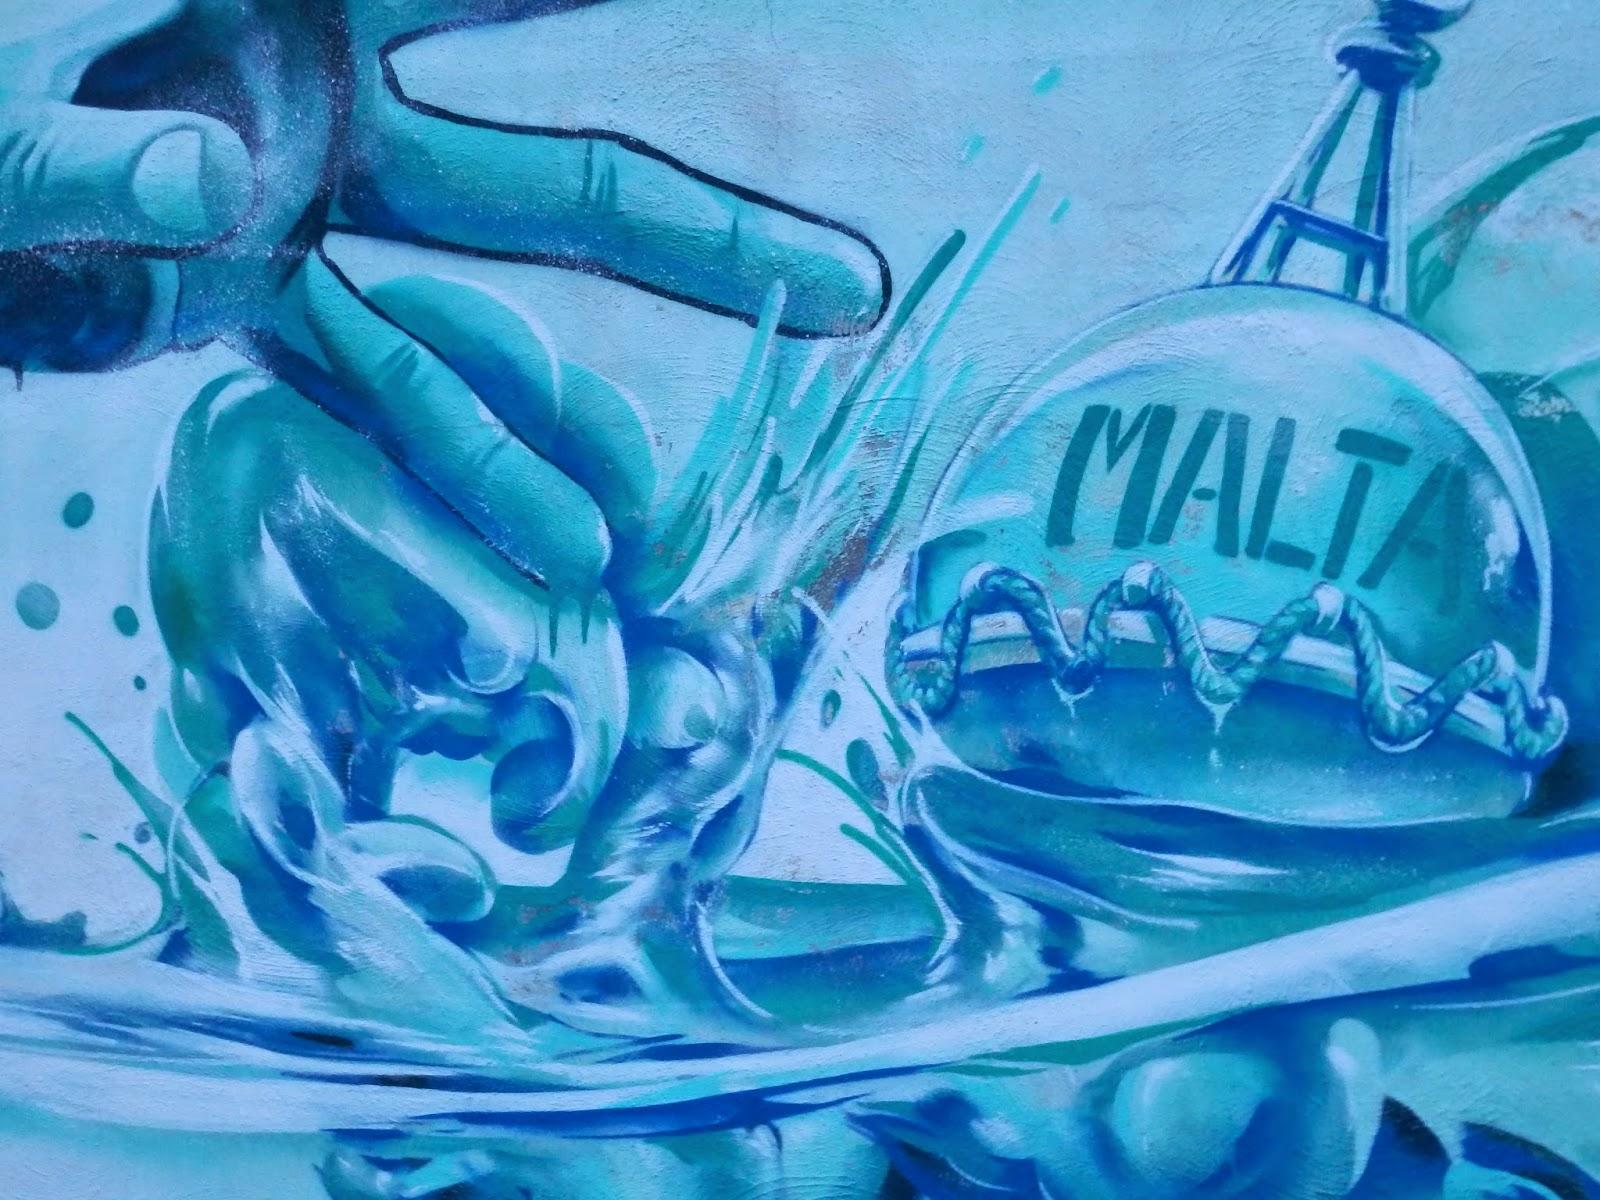 Street art in Malta